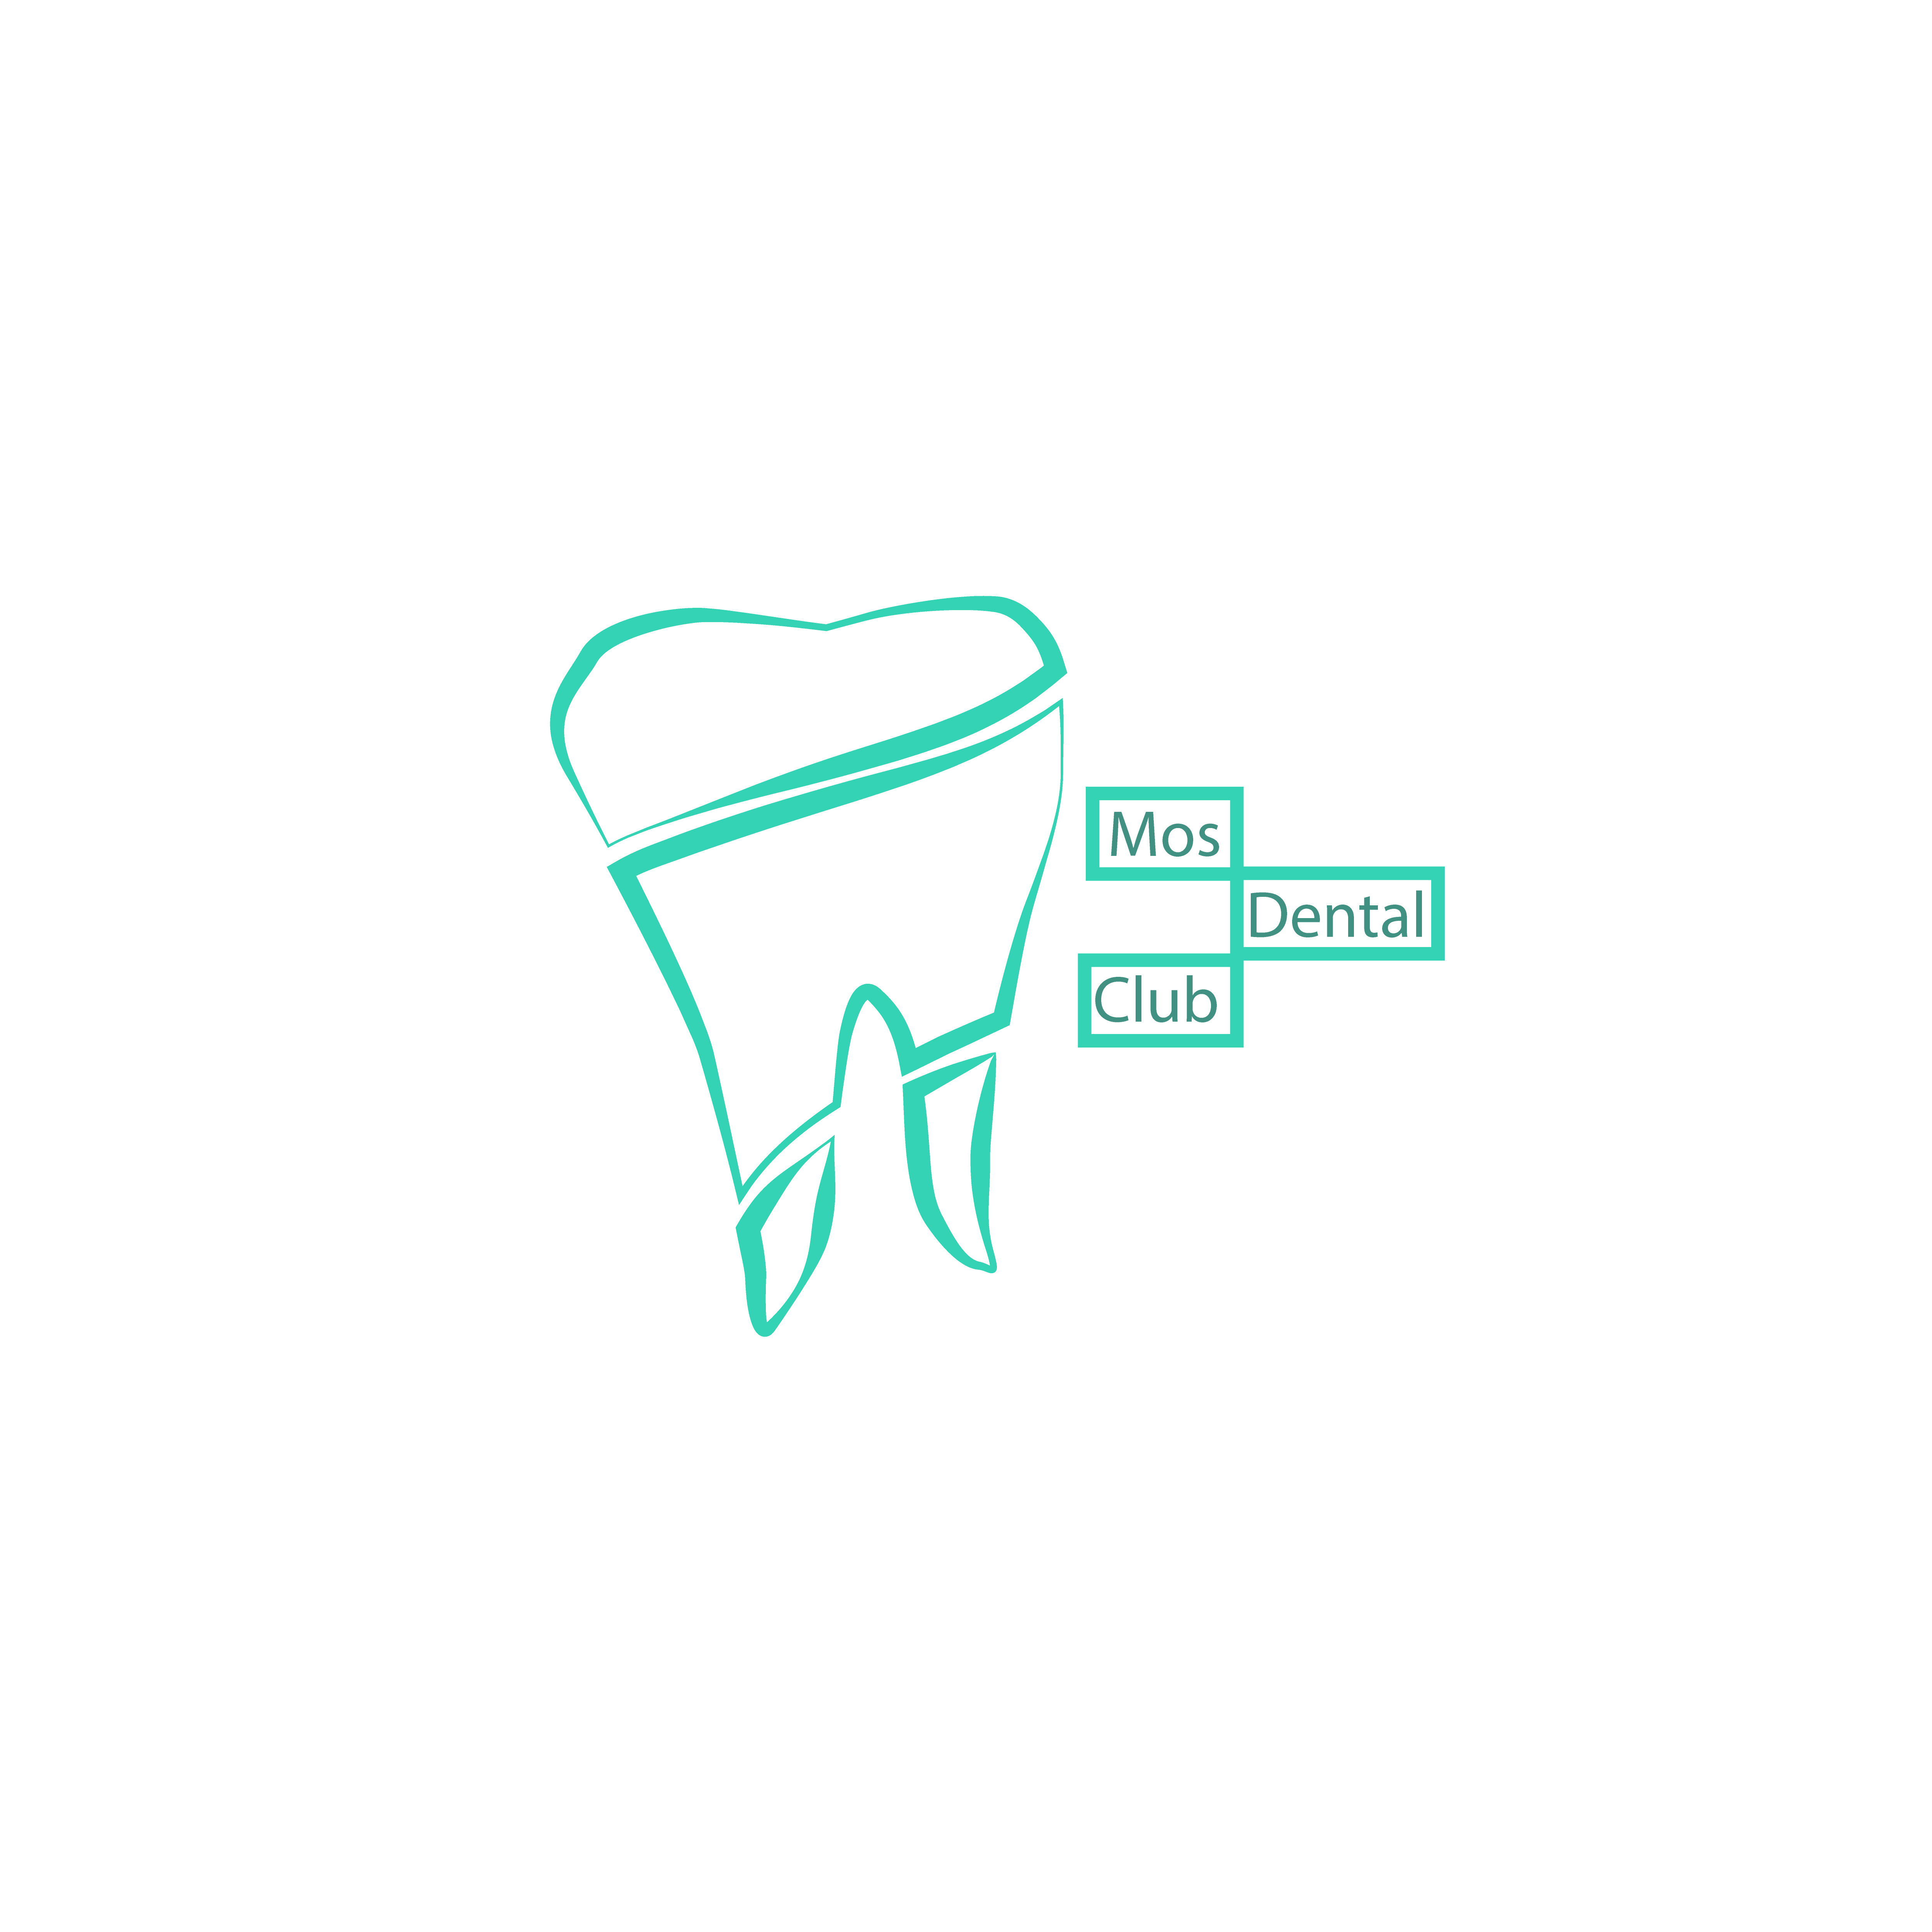 Разработка логотипа стоматологического медицинского центра фото f_7325e469efa9ab78.jpg